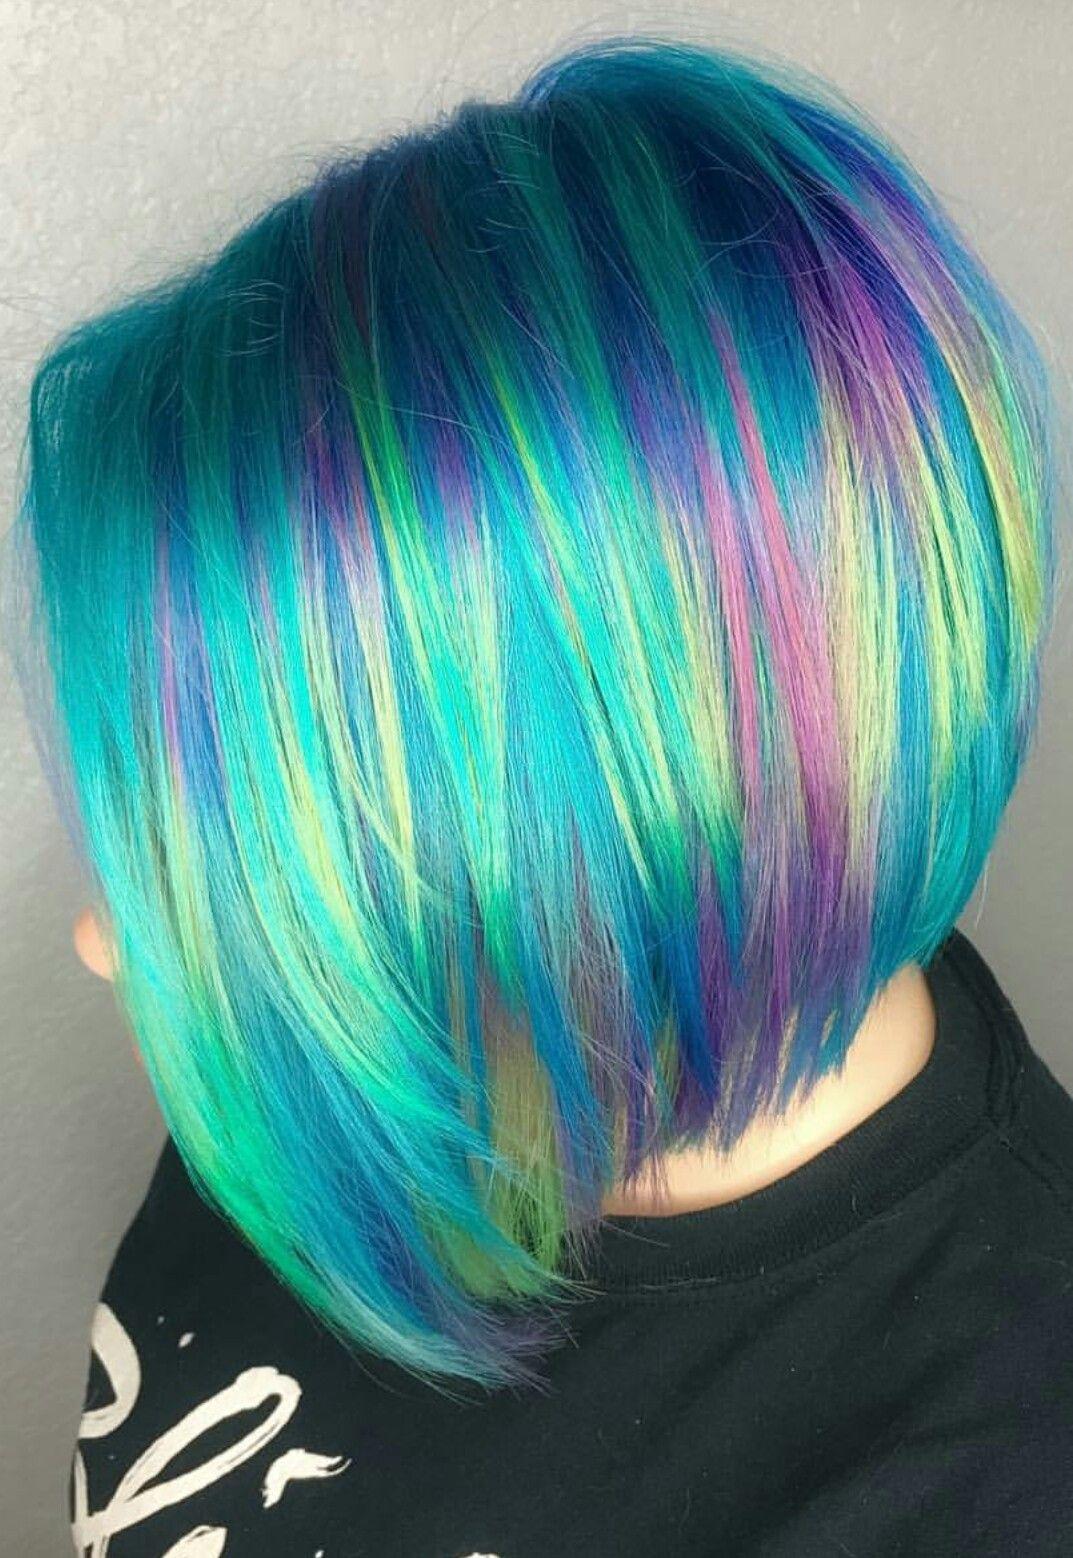 Dyed Hair Hair Styles Short Hair Styles Short Rainbow Hair